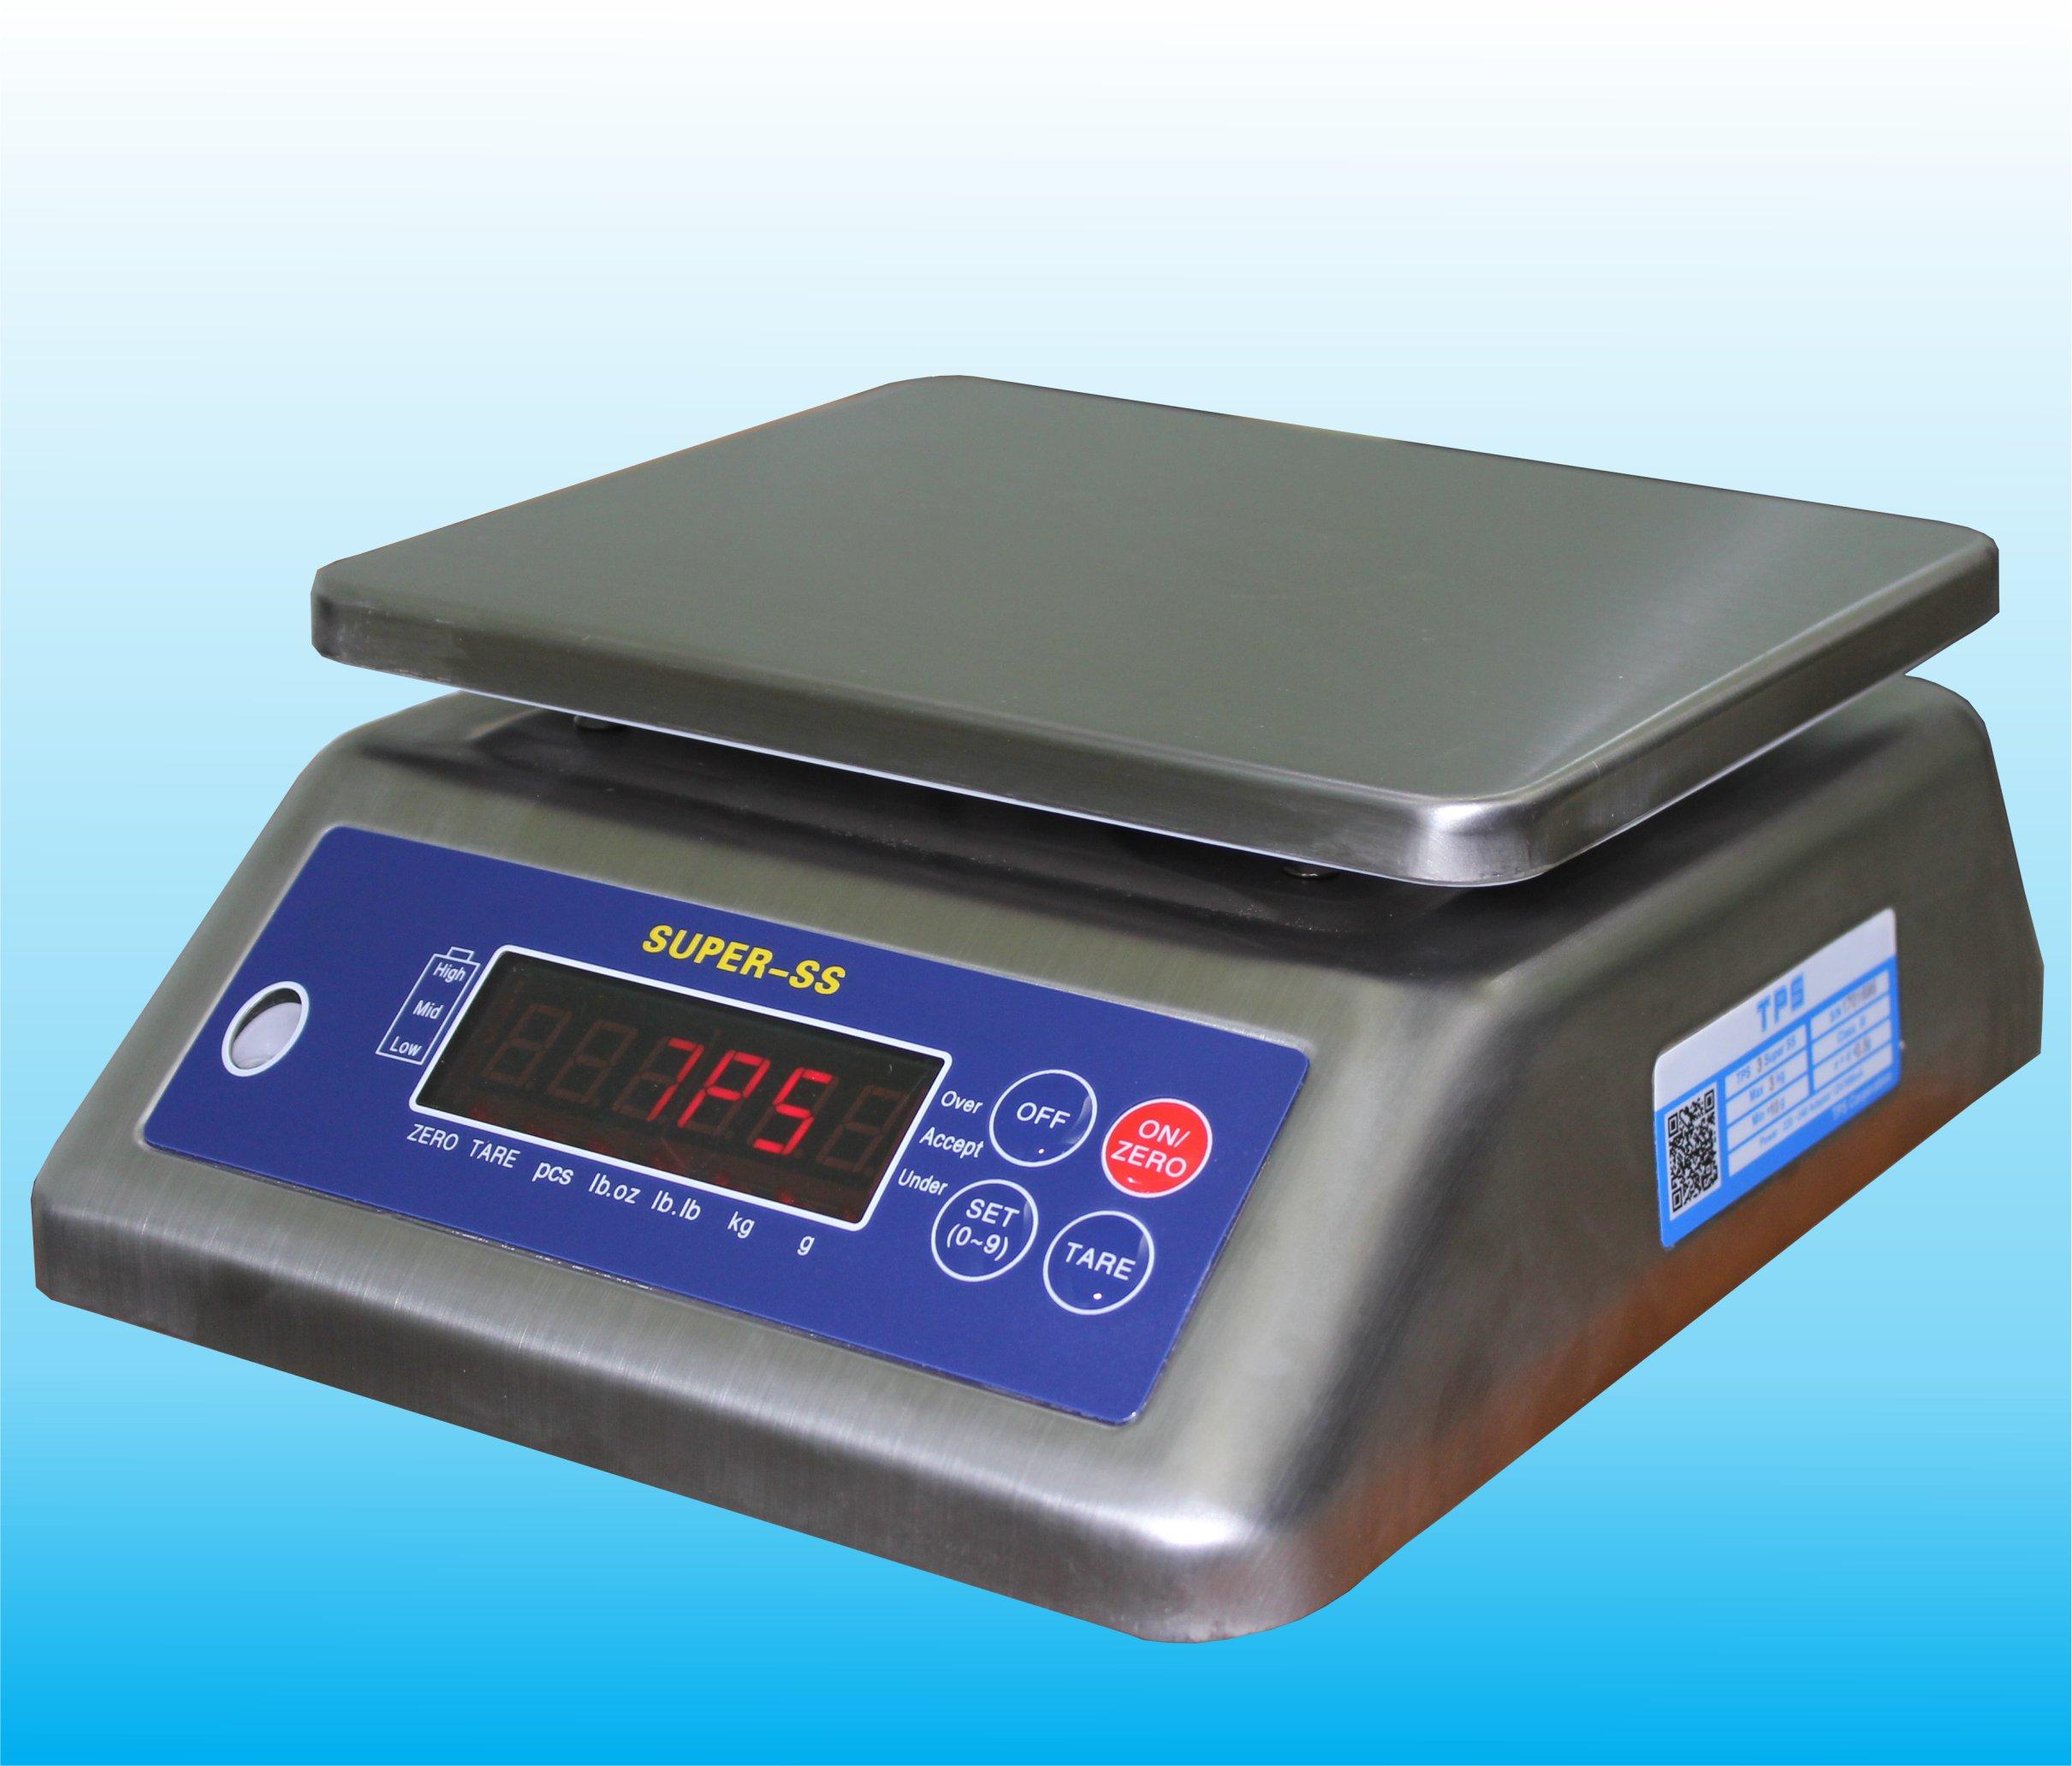 TPS6-SuperSS-6kg/1g - 394